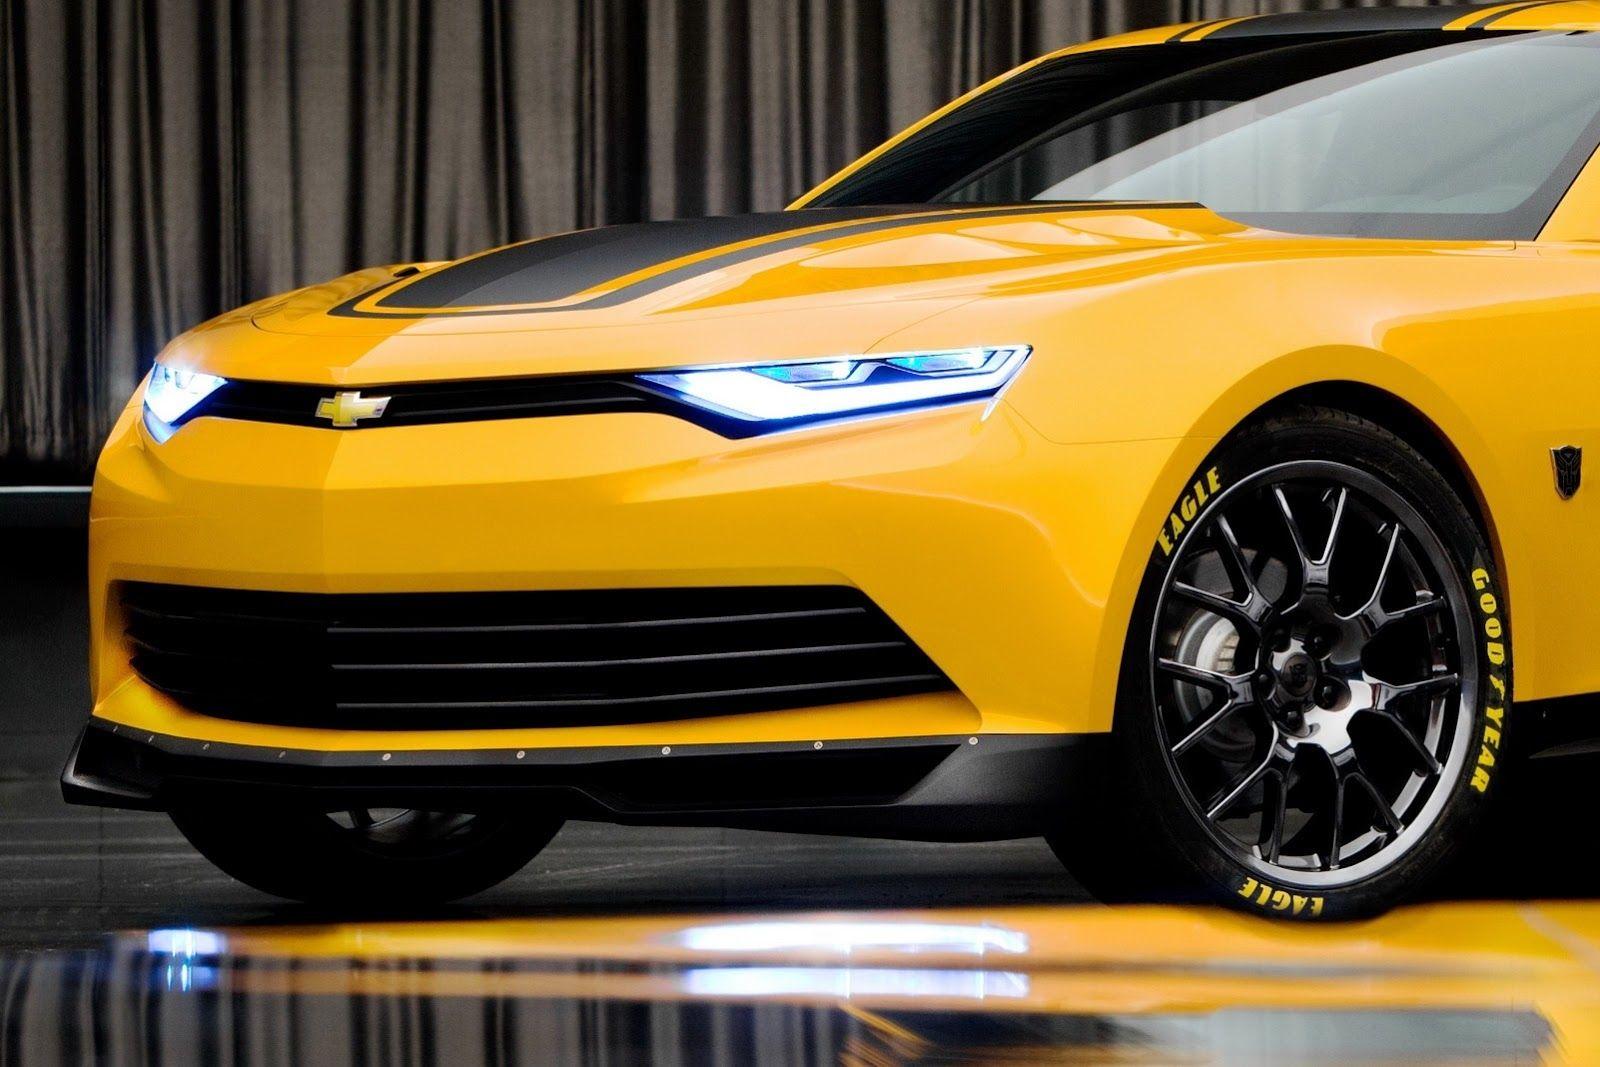 Chevrolet camaro 2014 transformers 4 bumble bee just got more badass